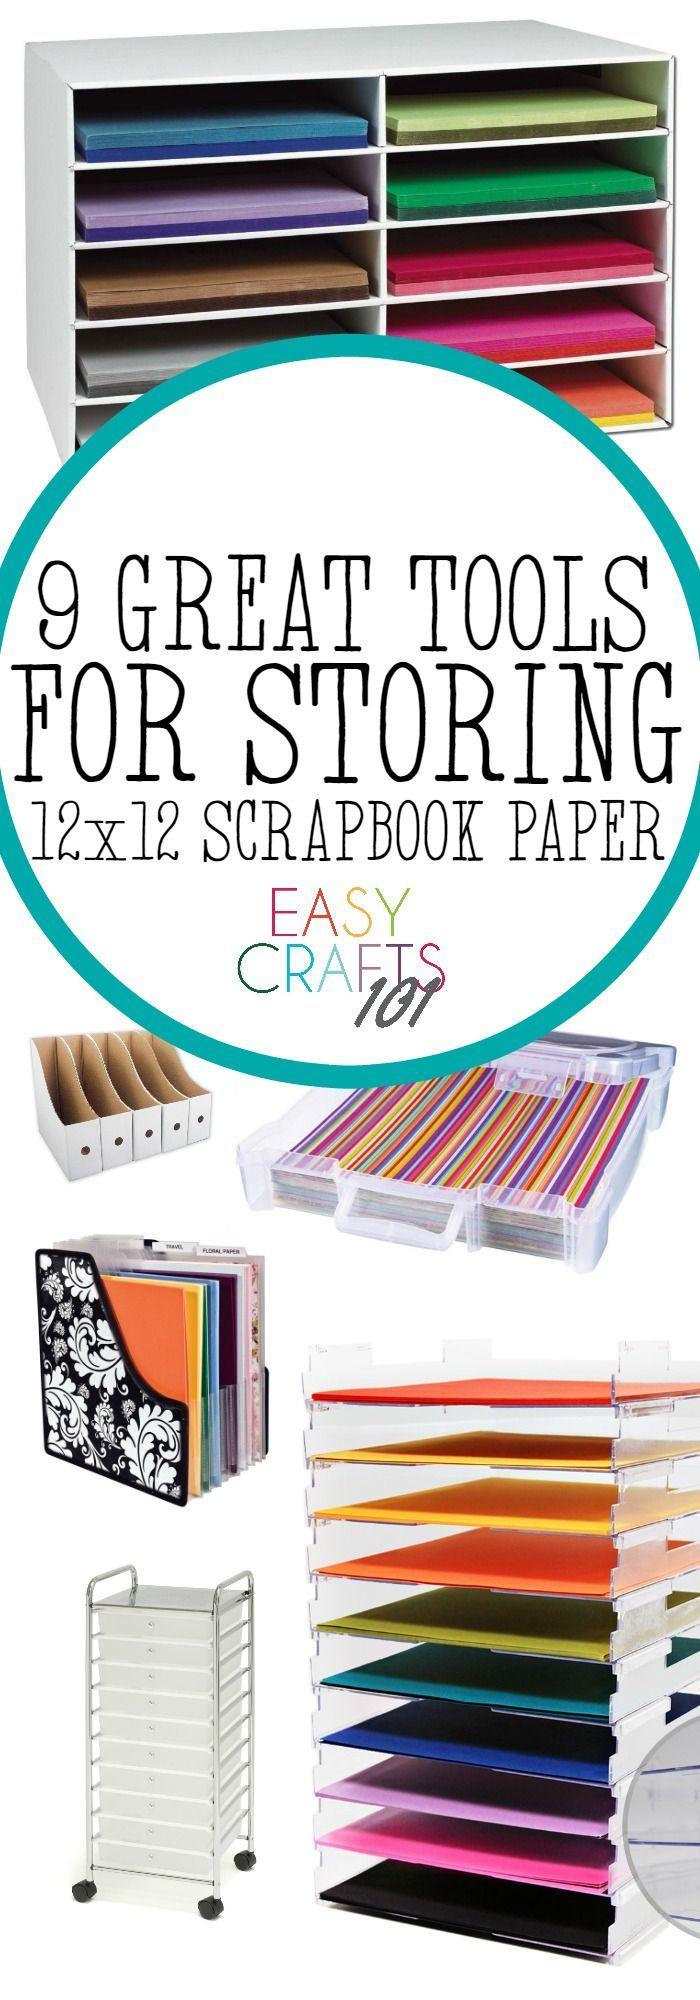 Scrapbook paper organization ideas - 25 Best Ideas About Organize Scrapbook Paper On Pinterest Organize Paper Scraps Craft Storage Box And Paper Box Tutorial